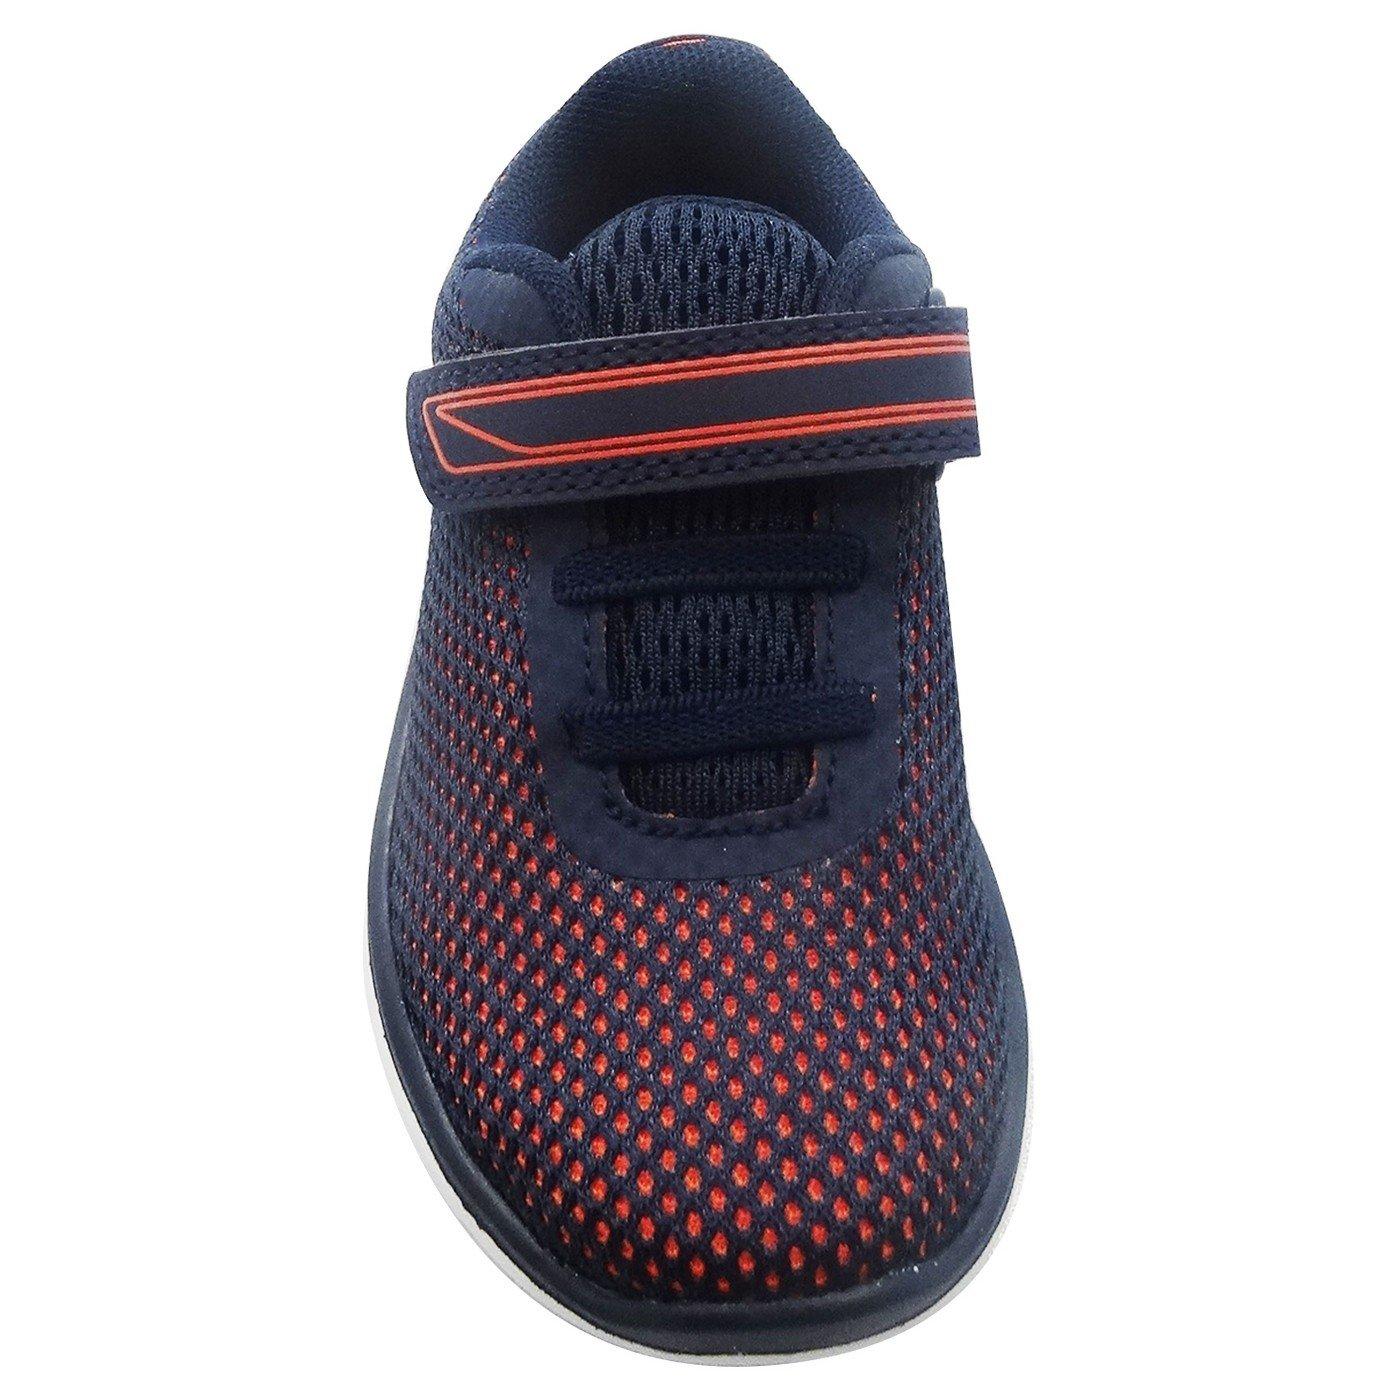 Orange Zapatillas ni/ño T7 Navy Blue Cat /& Jack Toddler Boys Mick Performance Athletic Mesh Shoes